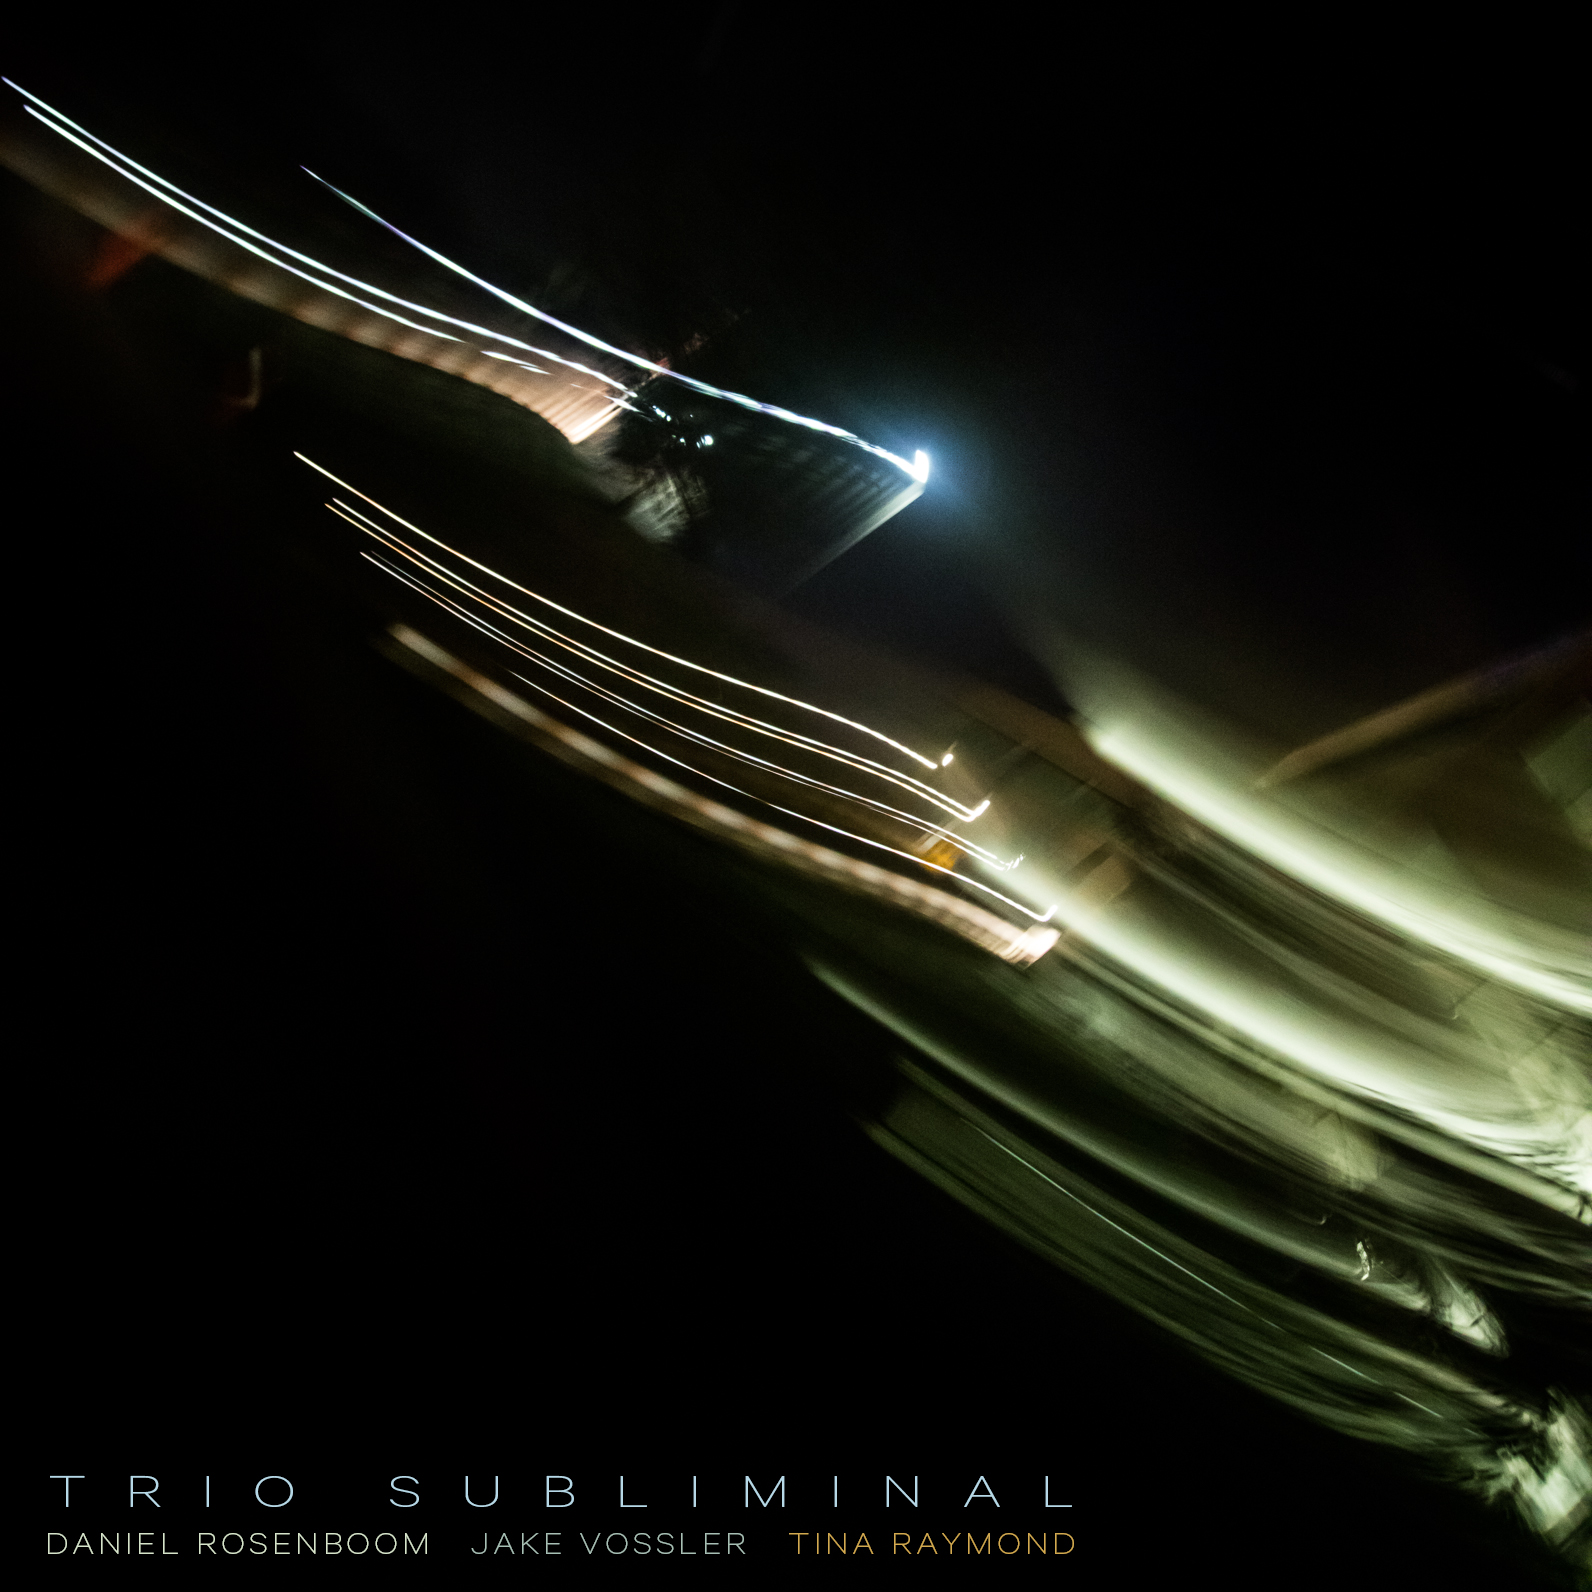 Daniel Rosenboom, Jake Vossler, Tina Raymond // Trio Subliminal